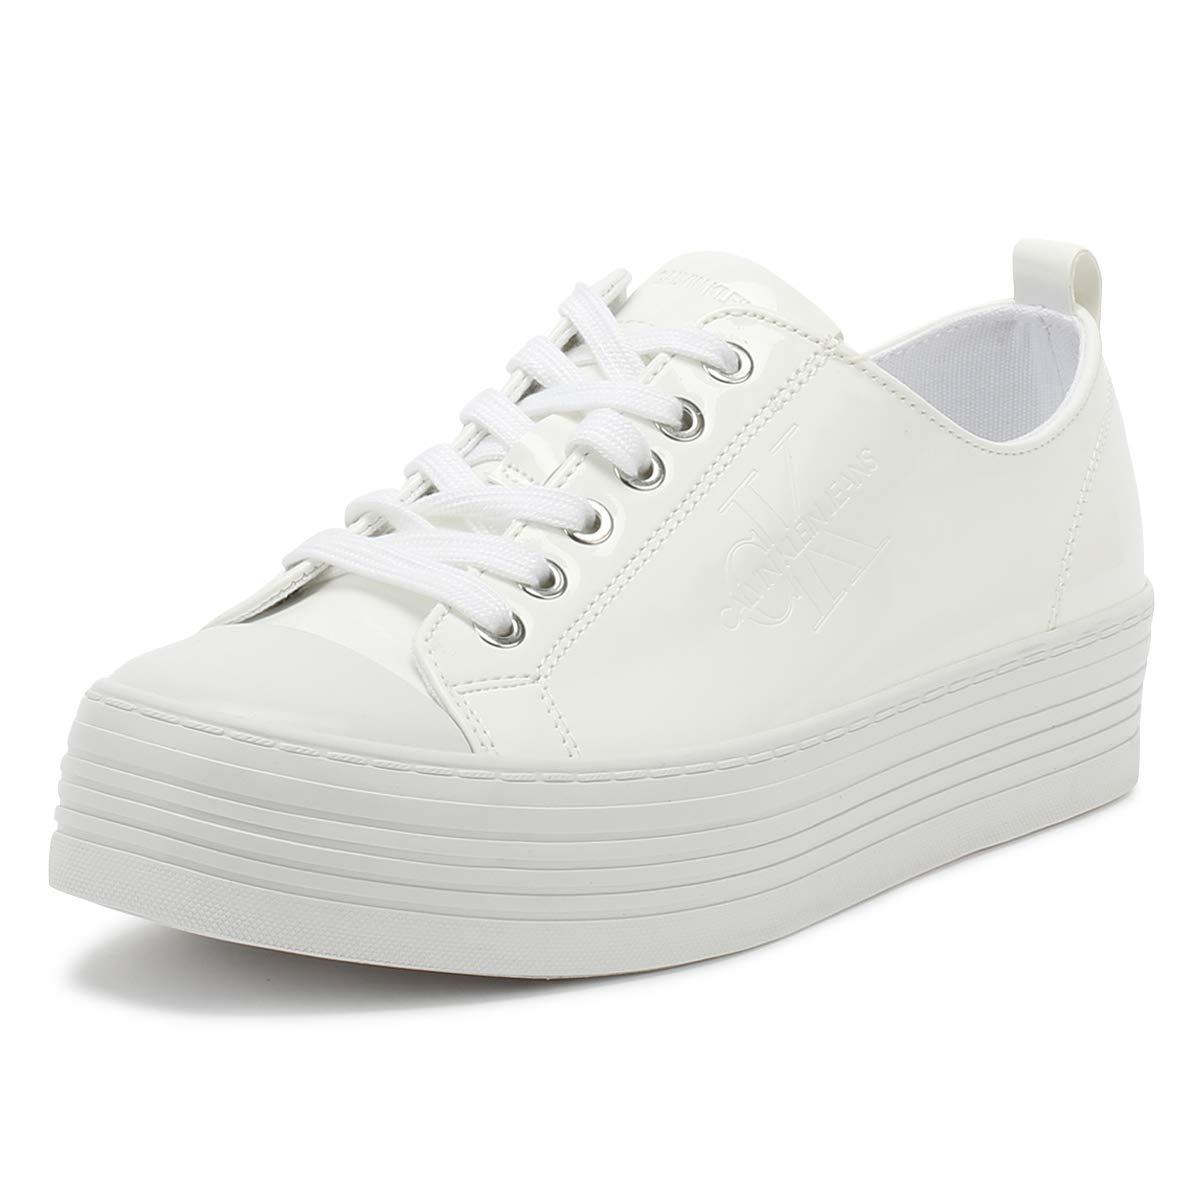 Calvin Klein Jeans Zolah Patent, Zapatillas para Mujer 36 EU|Blanco (White 000)